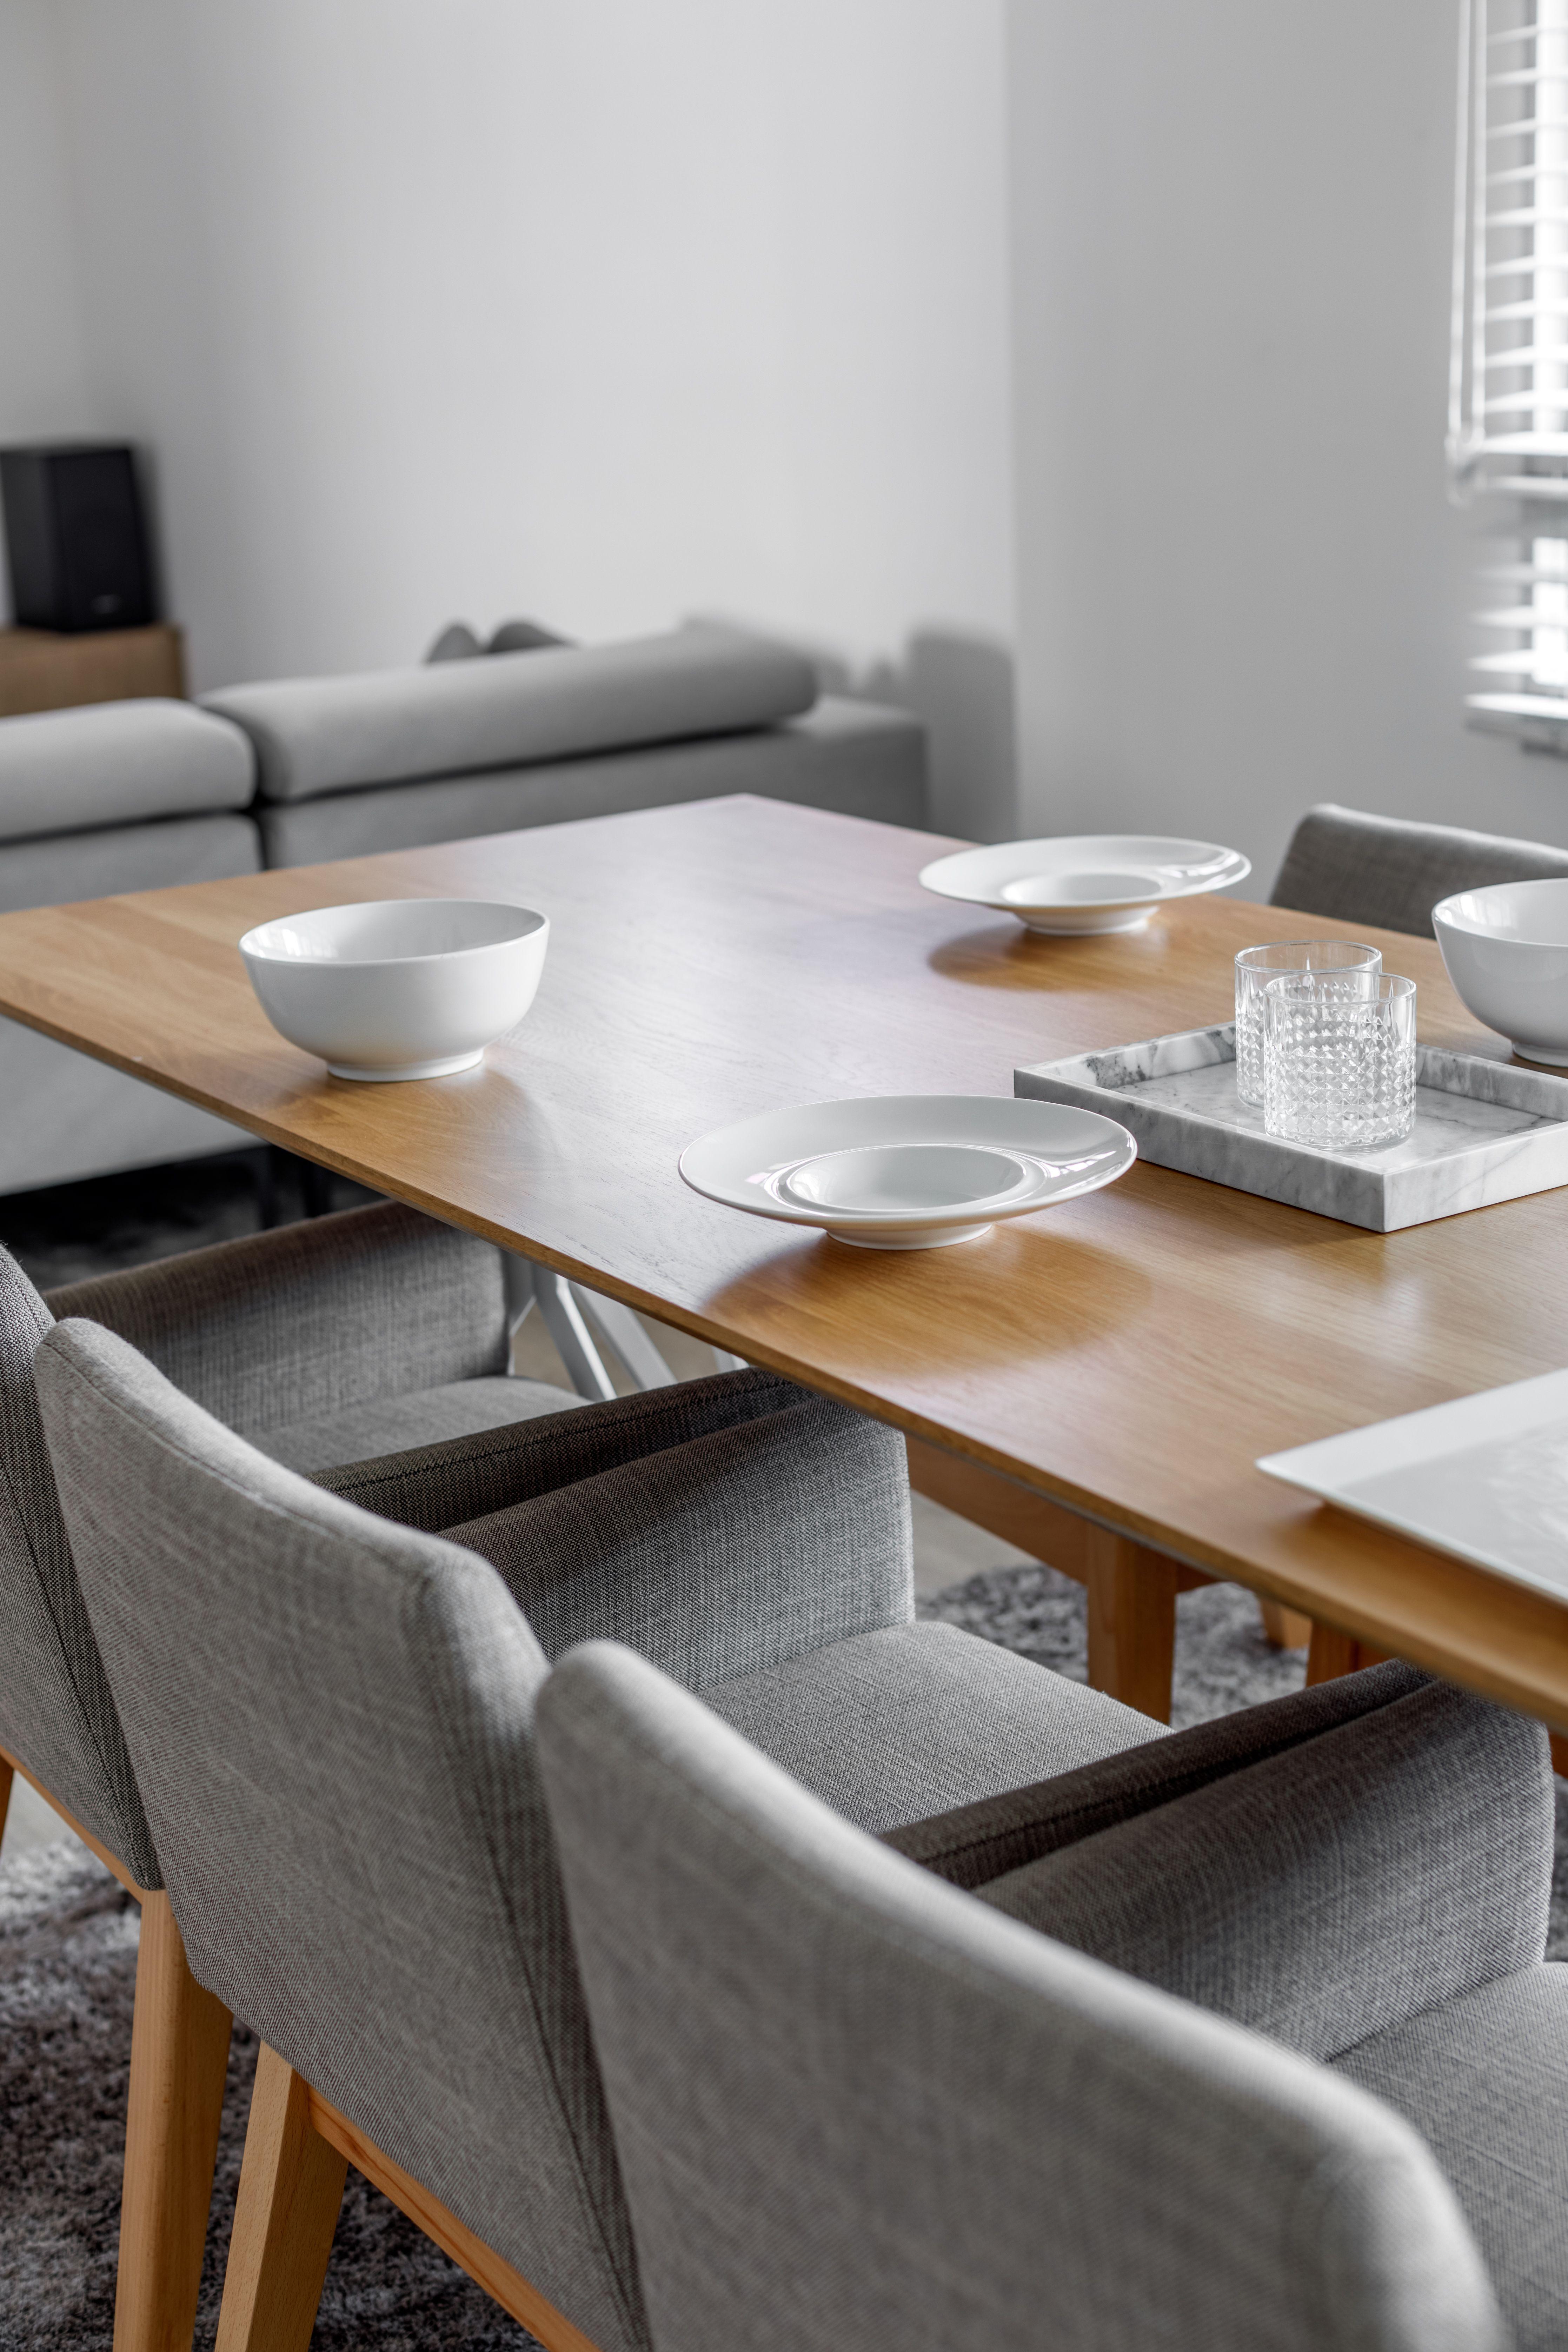 Minimalist Hdb Design: Minimalist Decor, White Interior, Wood